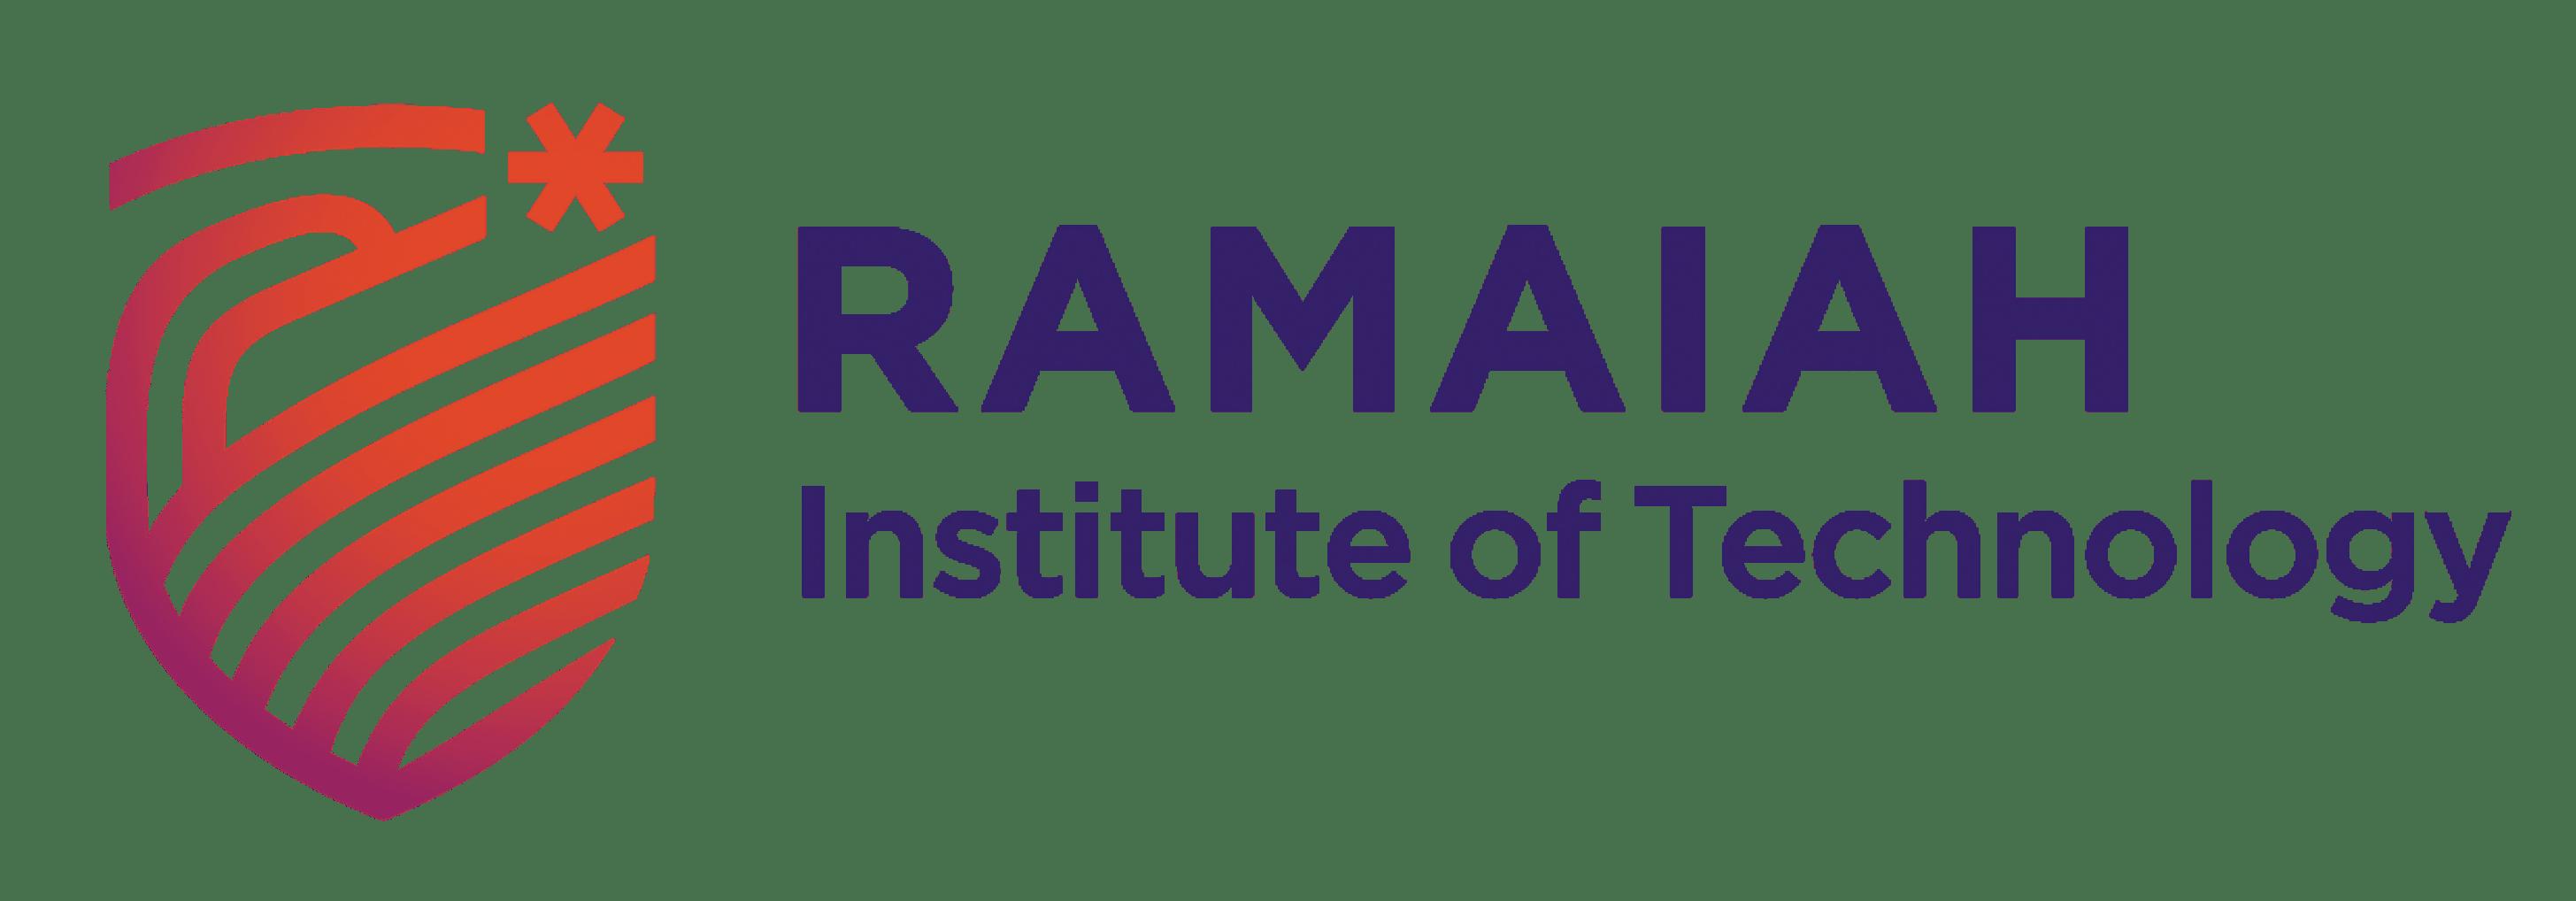 Ramaiah_IOT_-_Logo